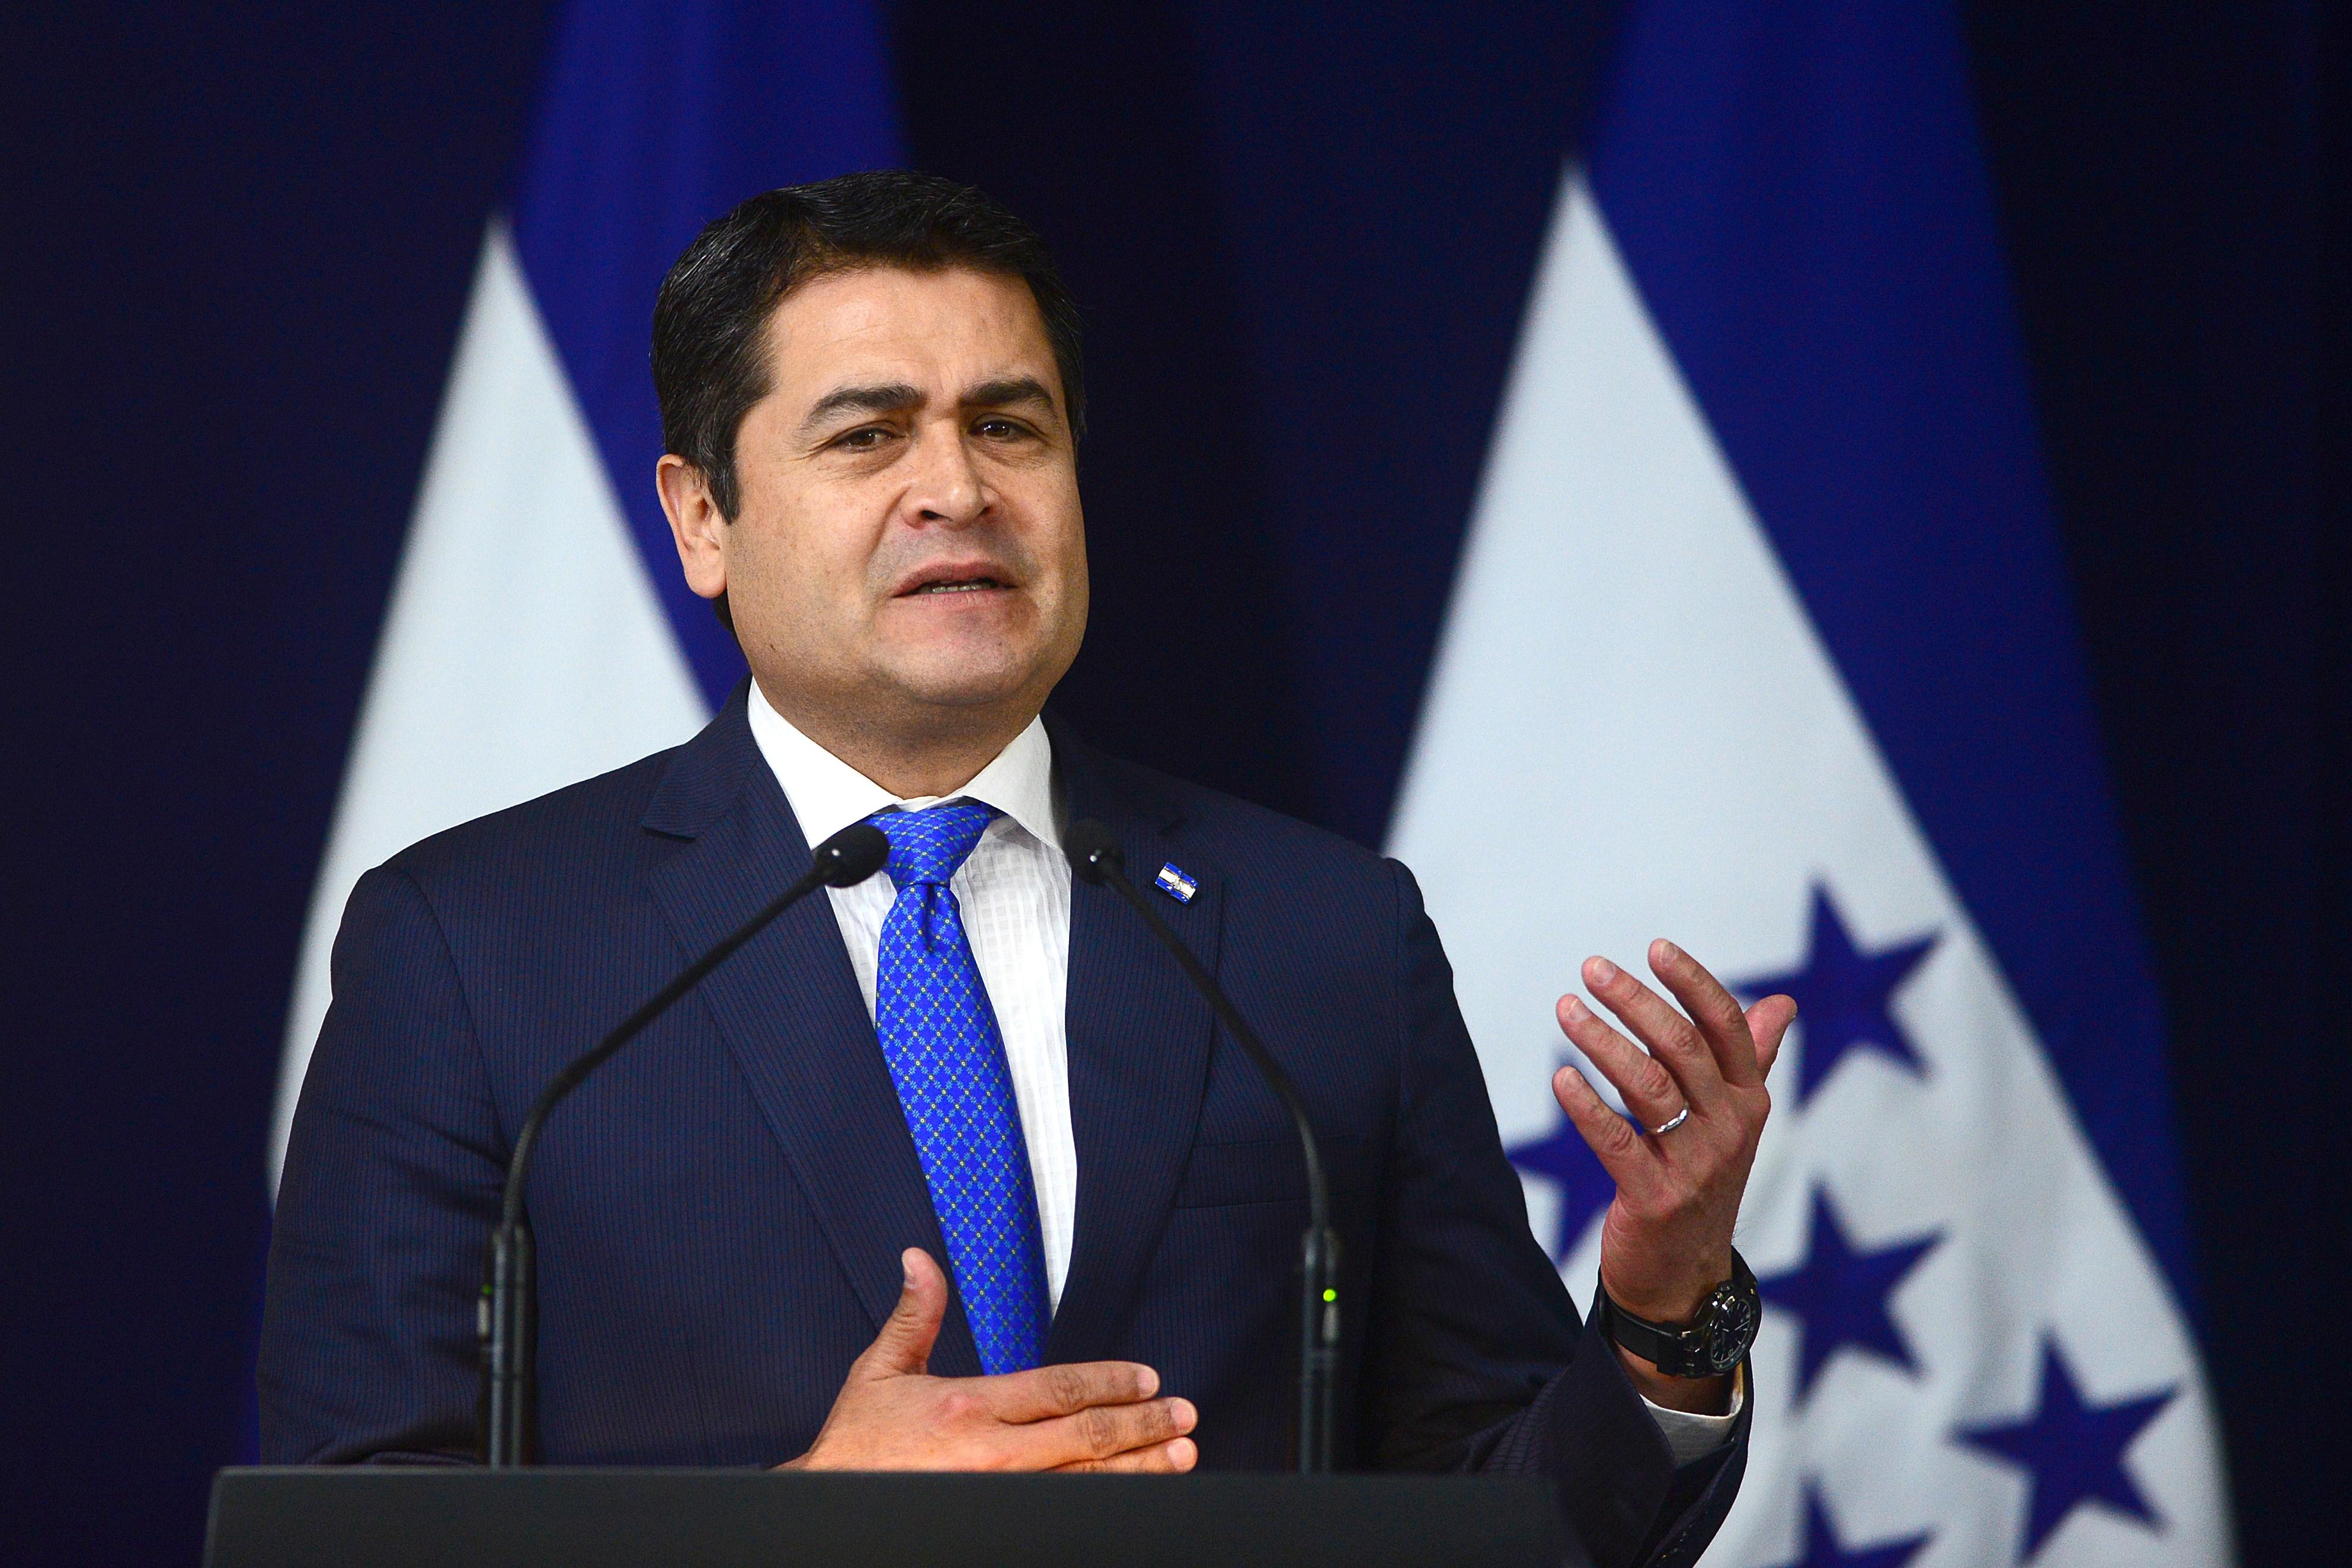 Juan Orlando Hernández, Honduras